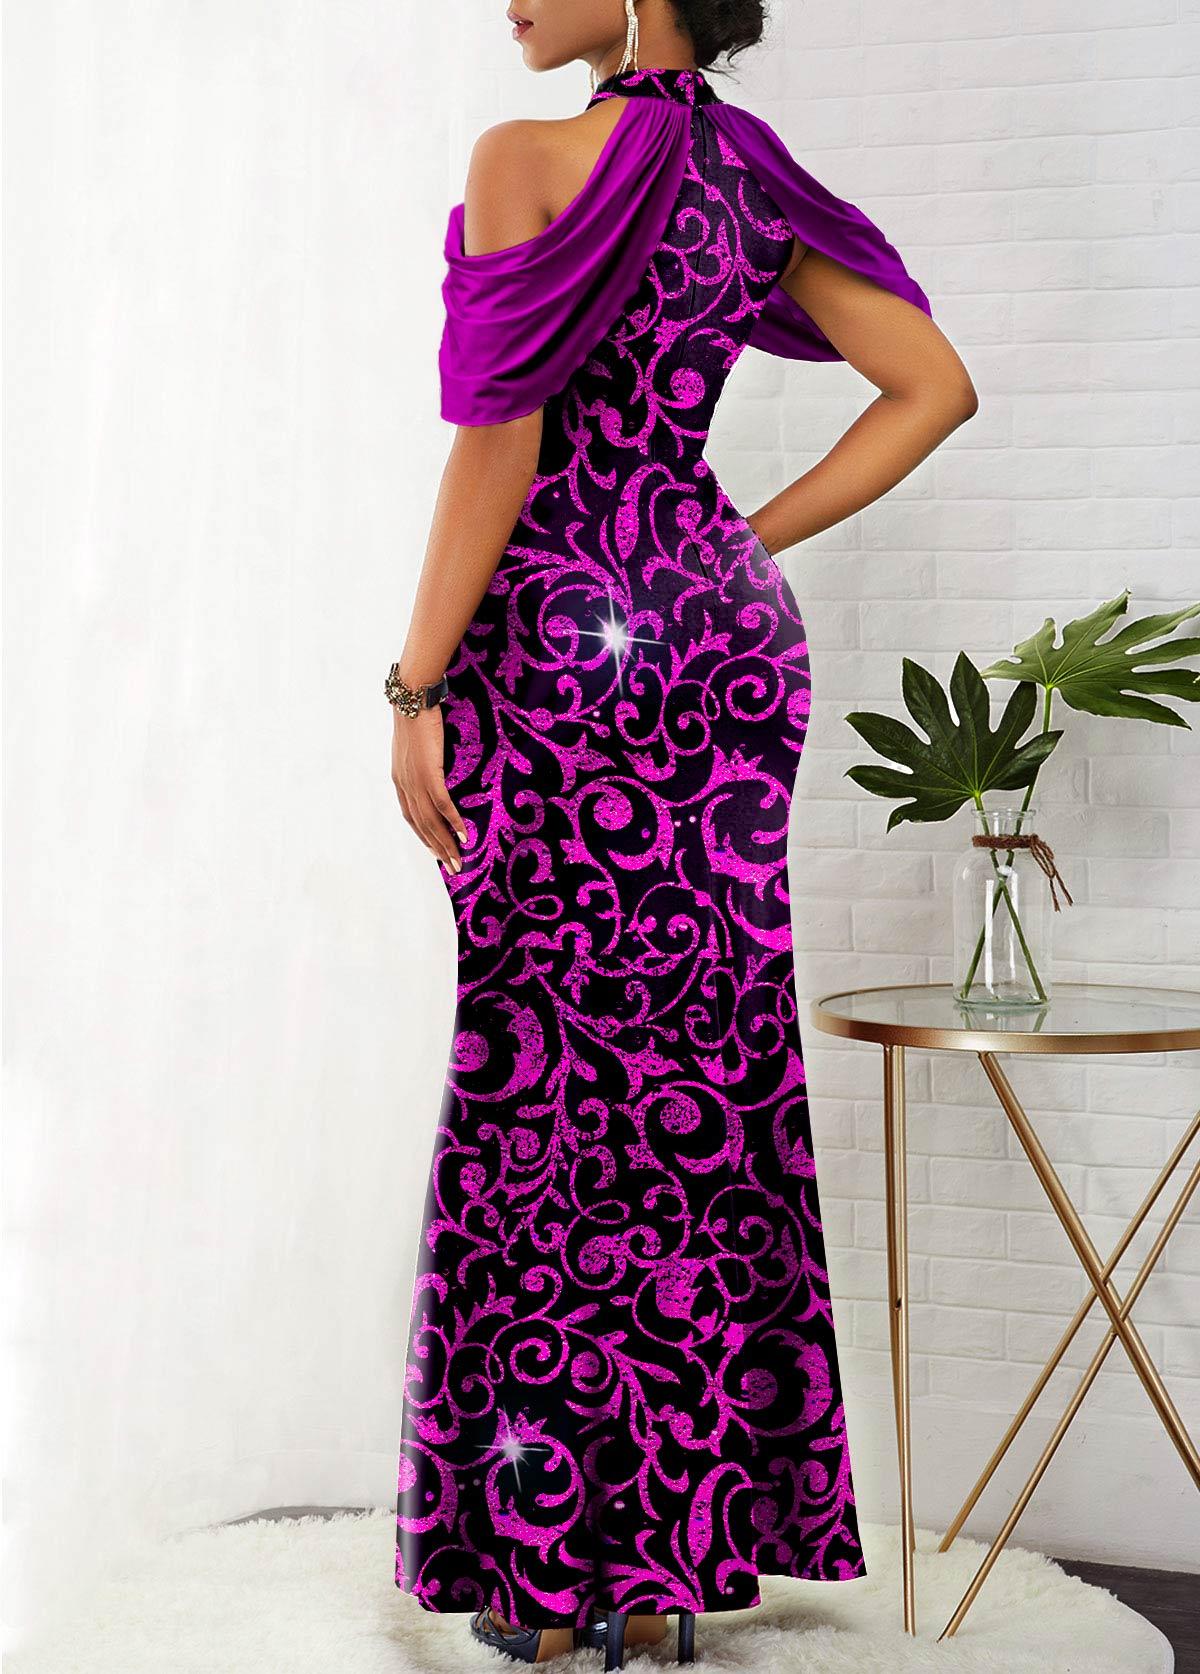 Shining Bib Neck Cold Shoulder Mermaid Dress